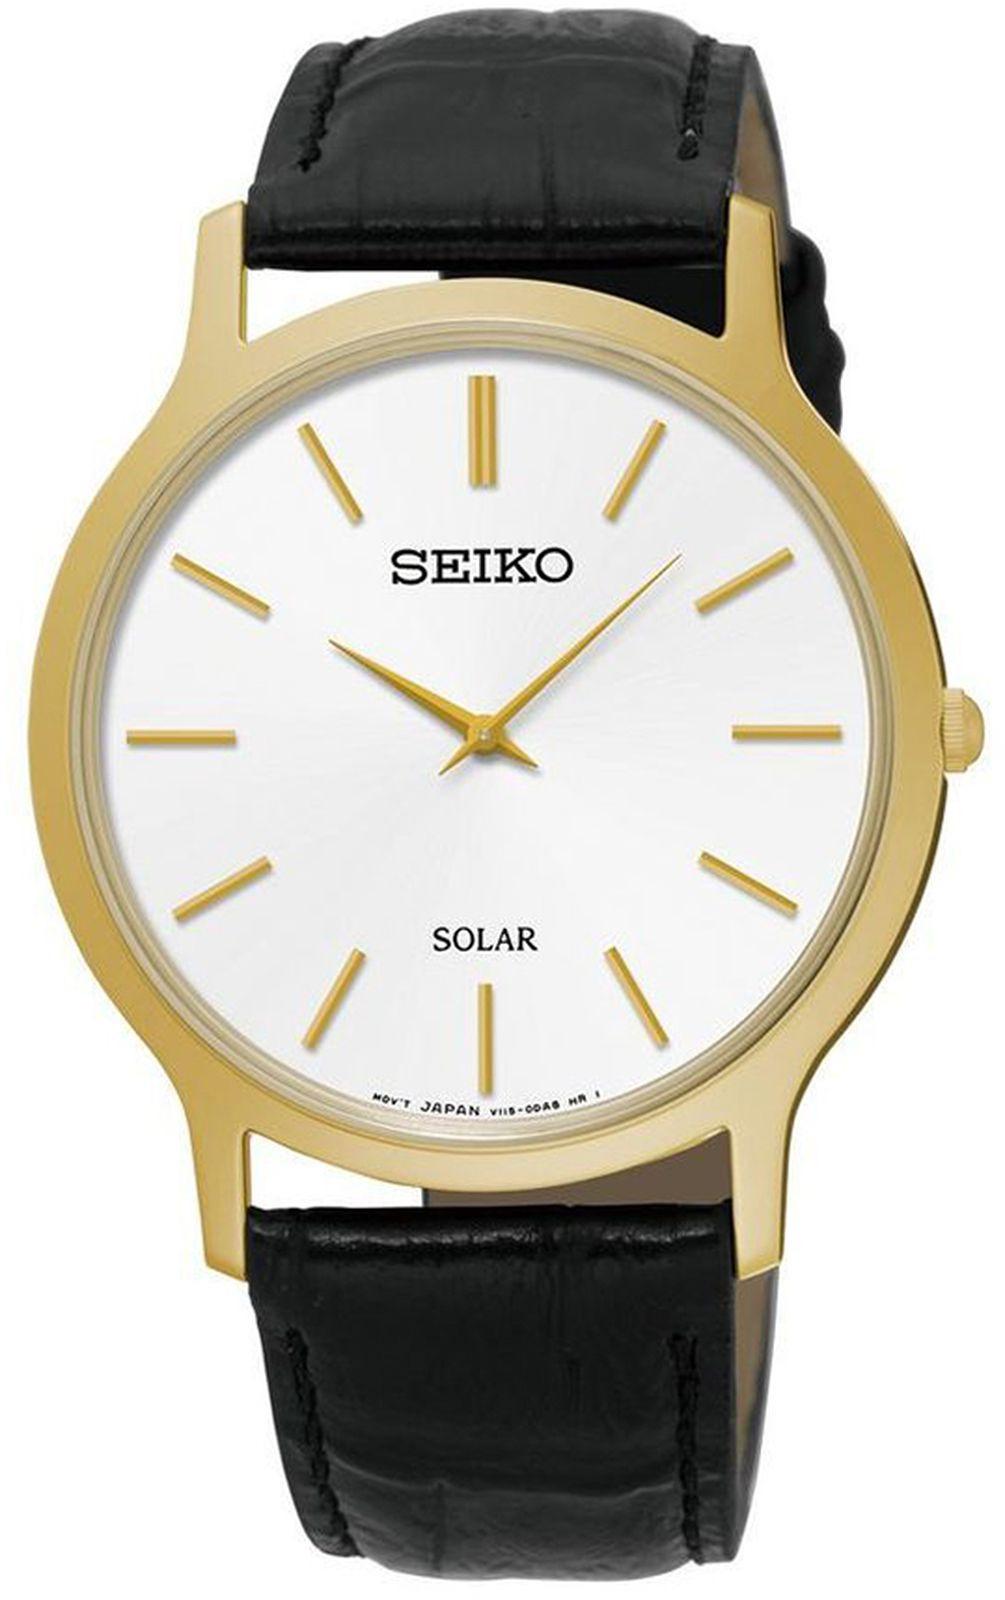 цена на Наручные часы Seiko мужские, черный